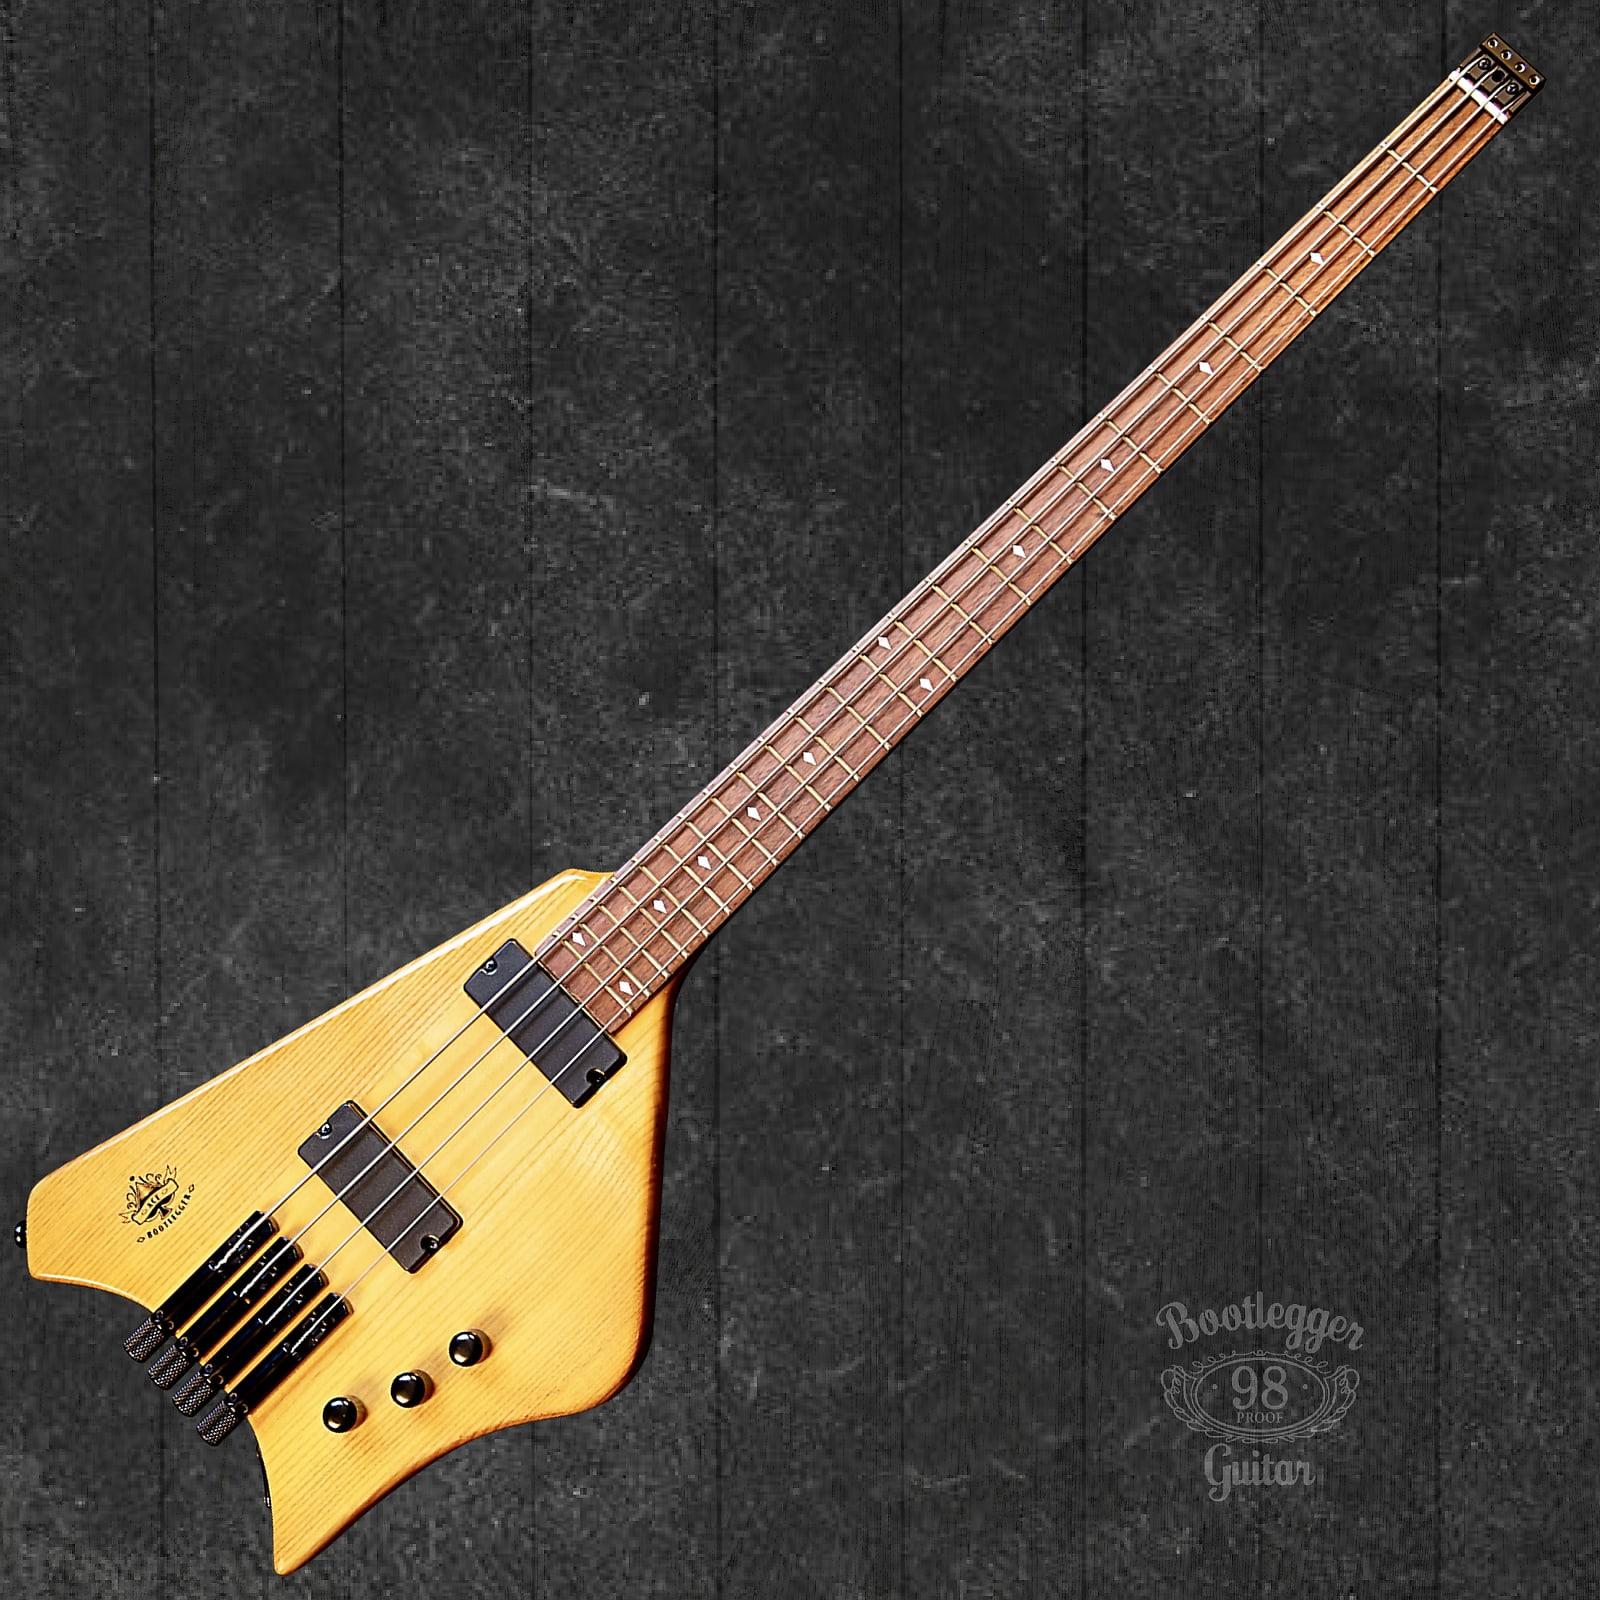 BootLegger Guitar Ace Headless Bass Honey Clear With Stiletto Case & Flask